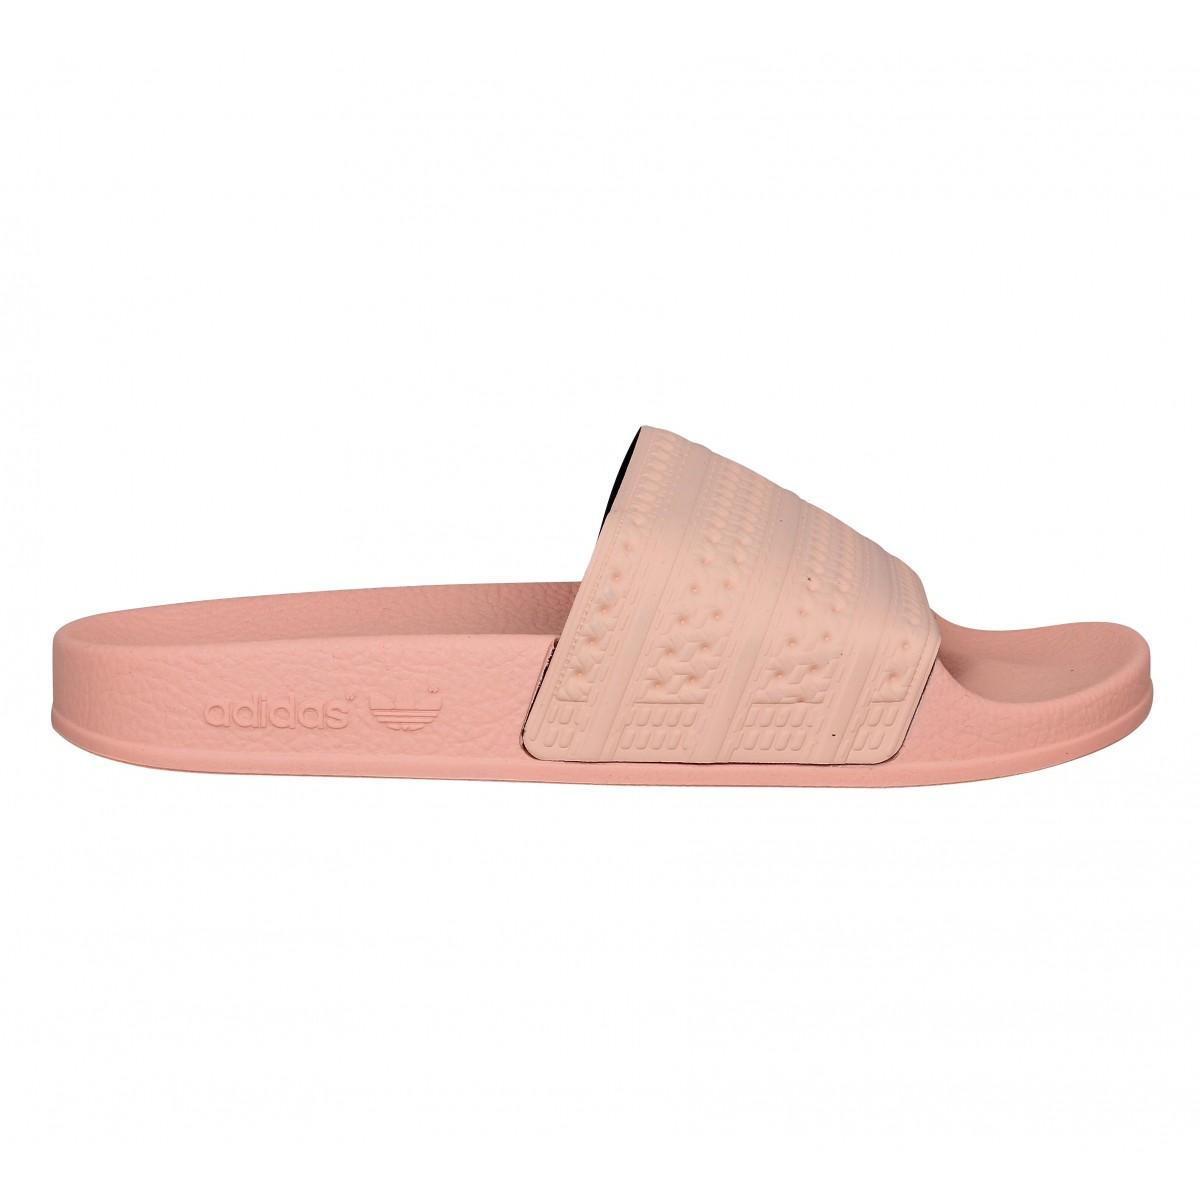 Chaussures Adidas Adilette roses femme Xd5oR6VJXa